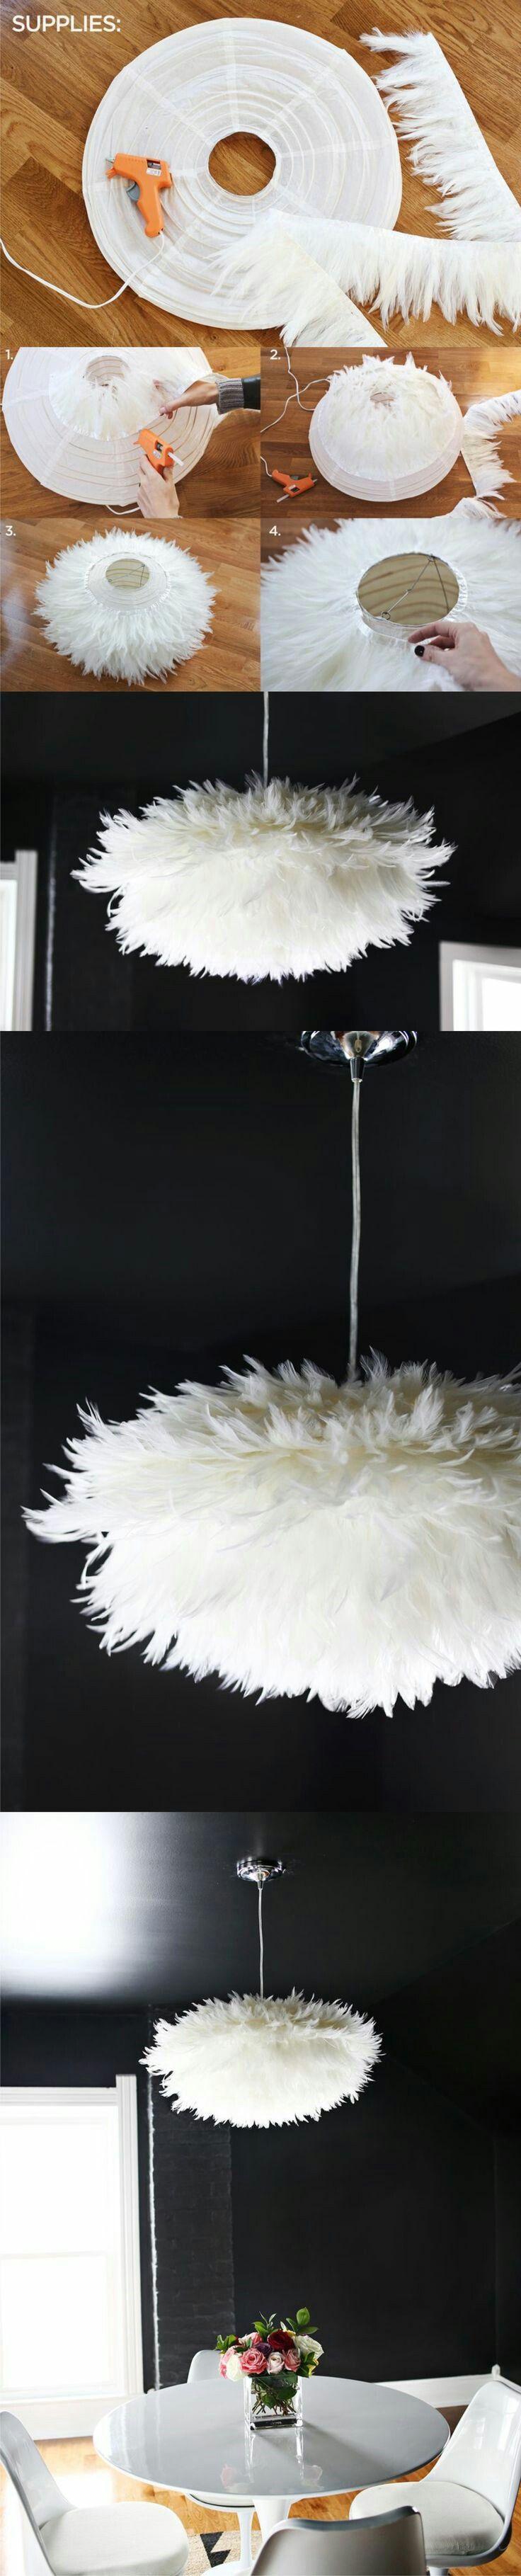 DIY Feather chandelier